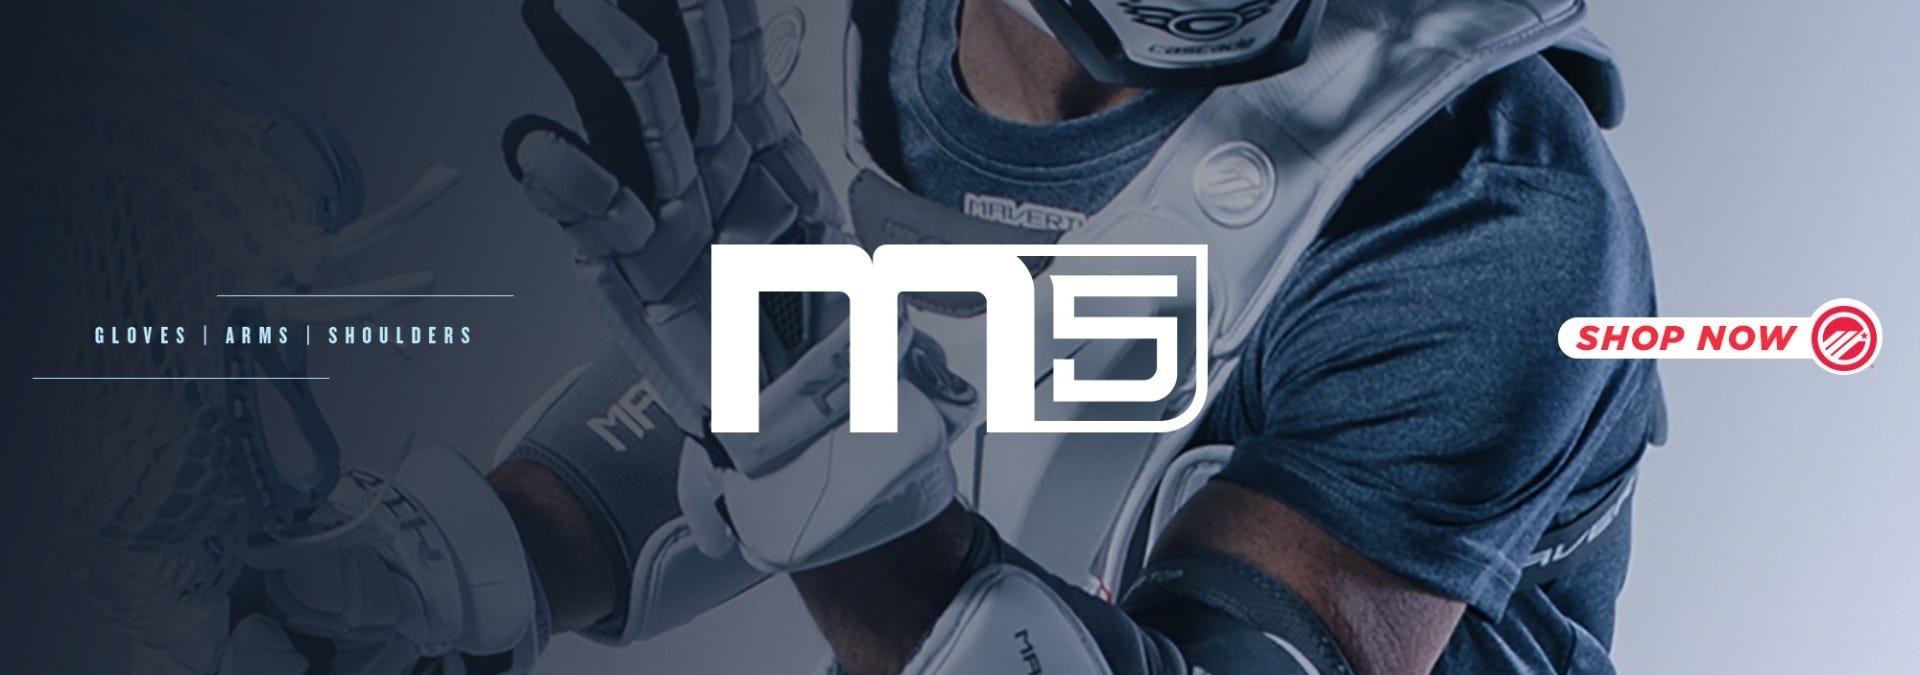 Maverik M5